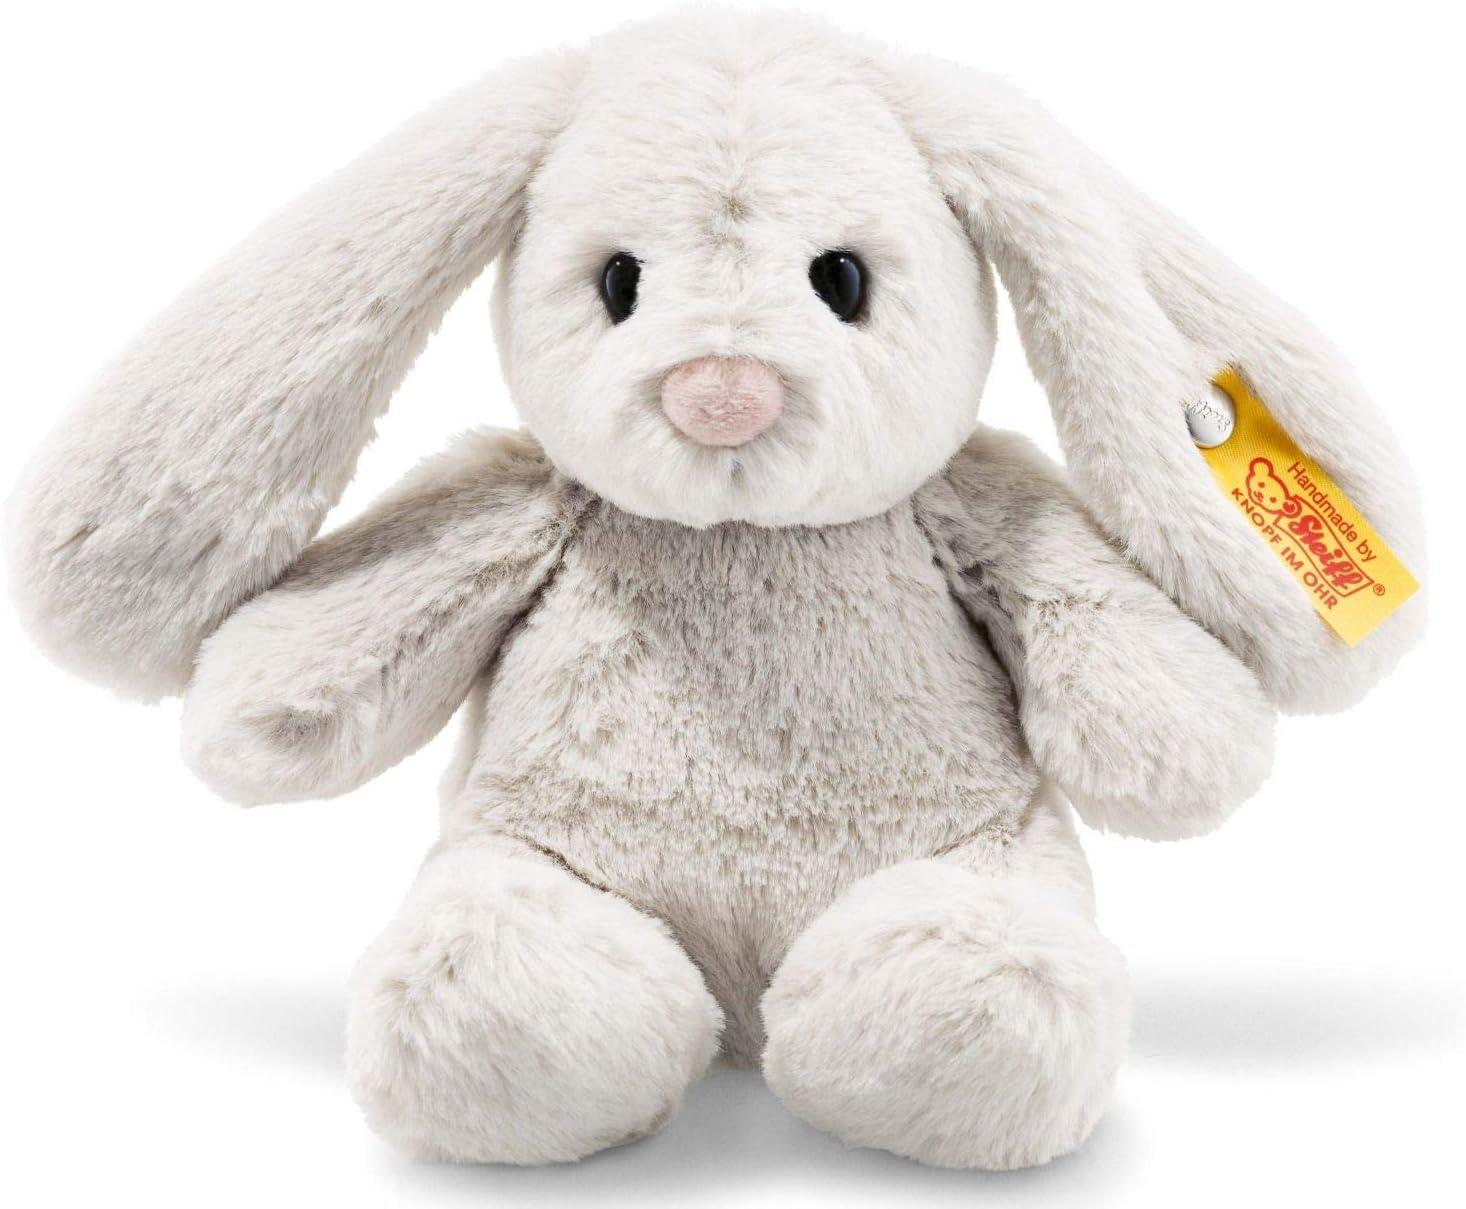 Steiff Hoppie 080463 - Conejo de Peluche con Orejas Plegables, 18 cm, Suave Peluche para niños, móvil y Lavable, Color Gris Claro